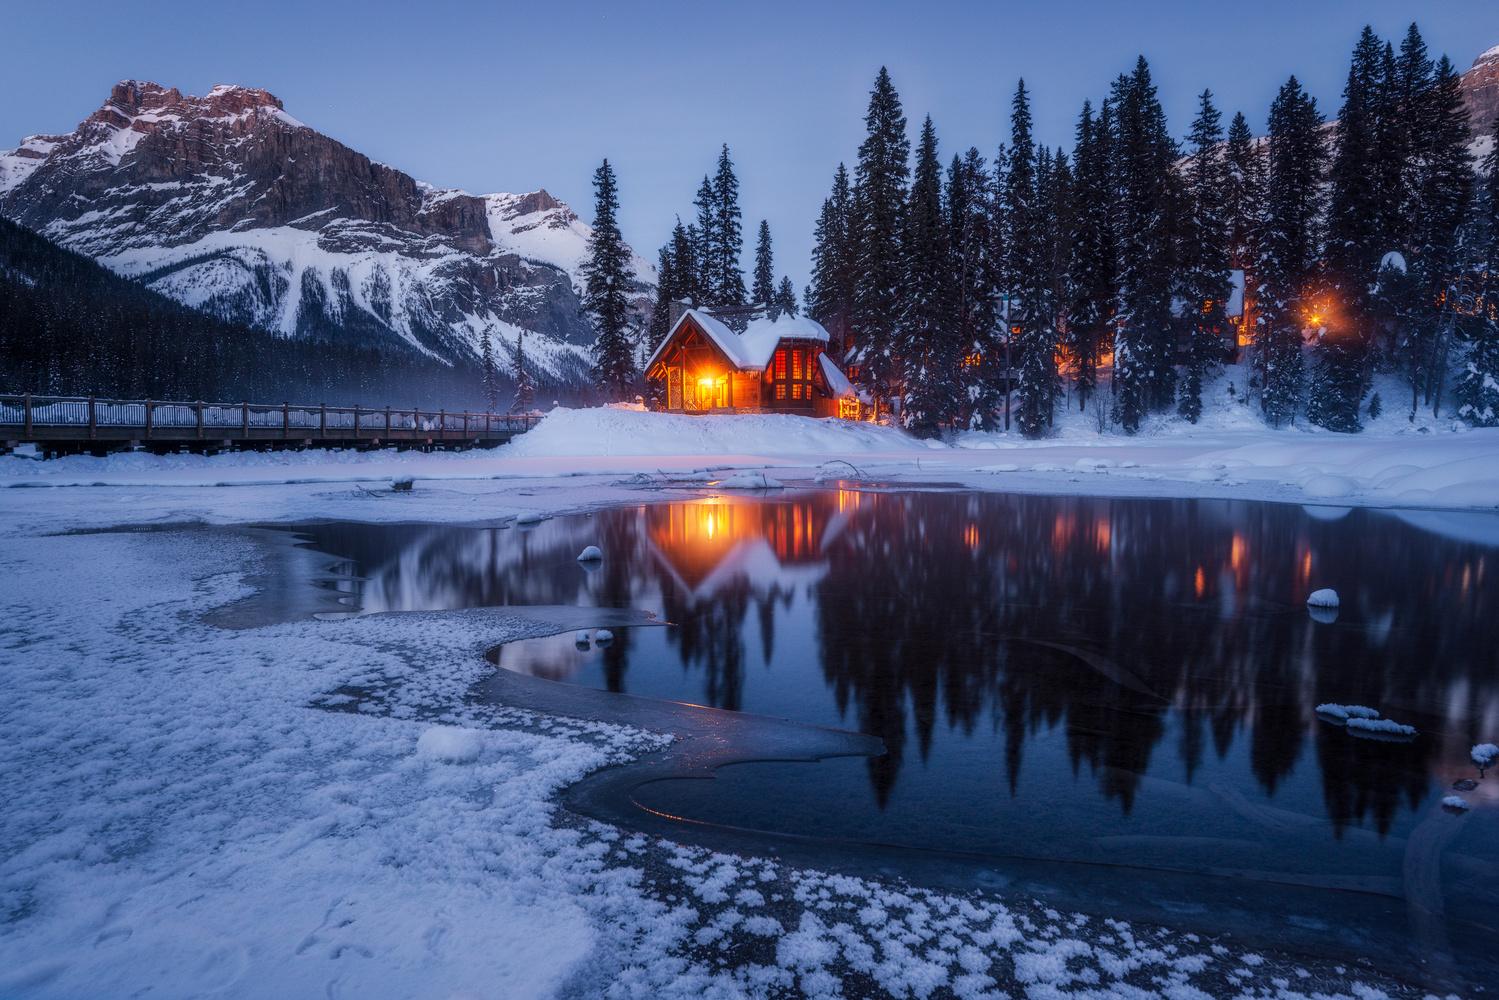 Lake House by Jose Marvin Evasco